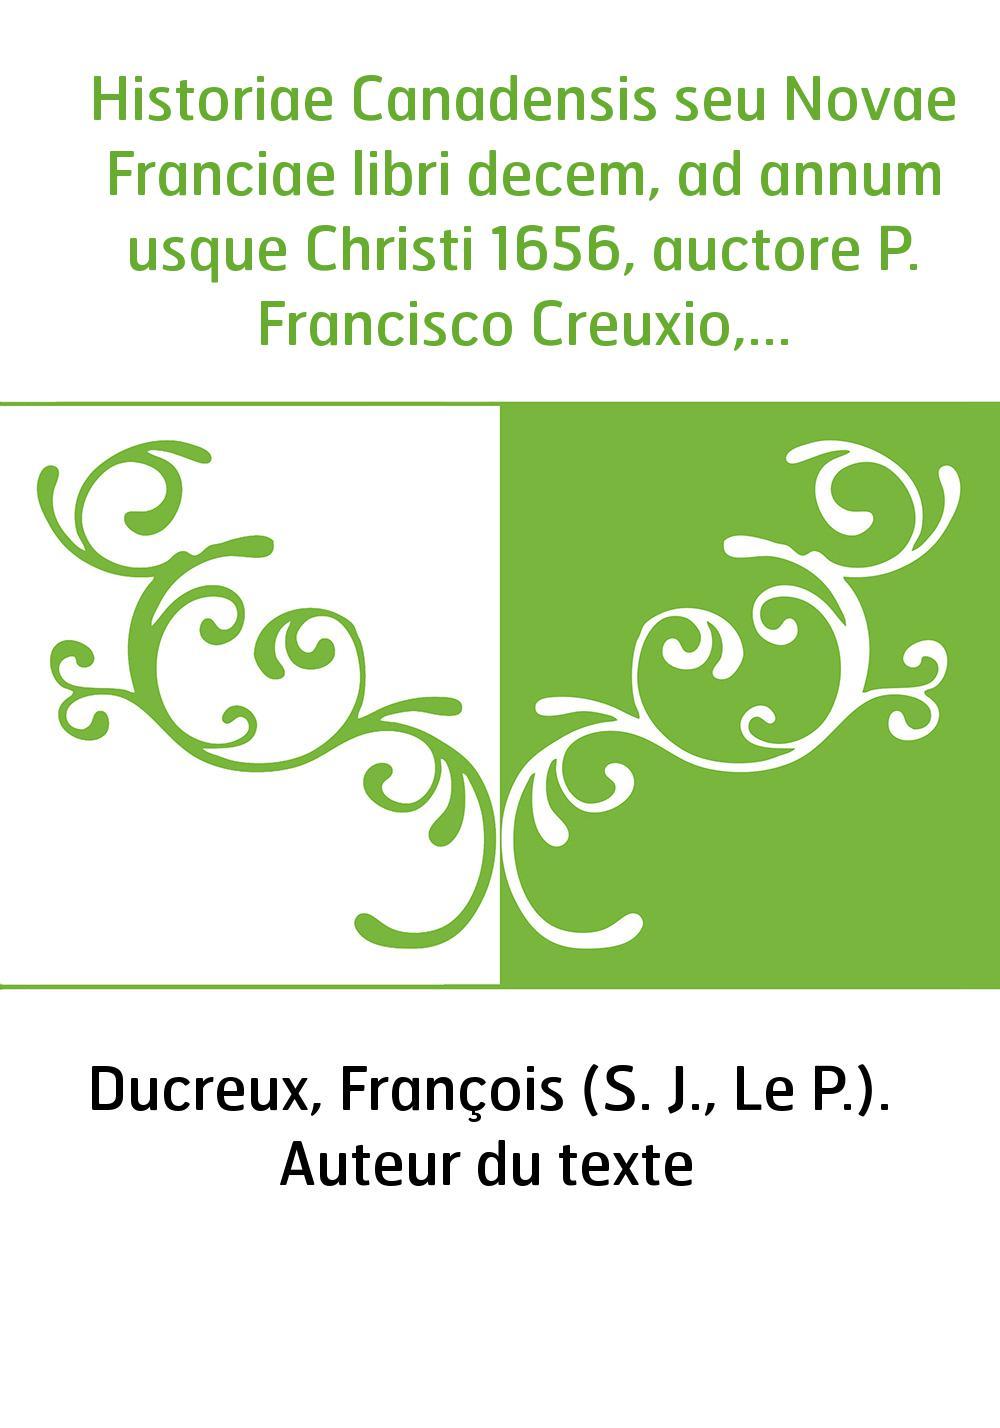 Historiae Canadensis seu Novae Franciae libri decem, ad annum usque Christi 1656, auctore P. Francisco Creuxio,...